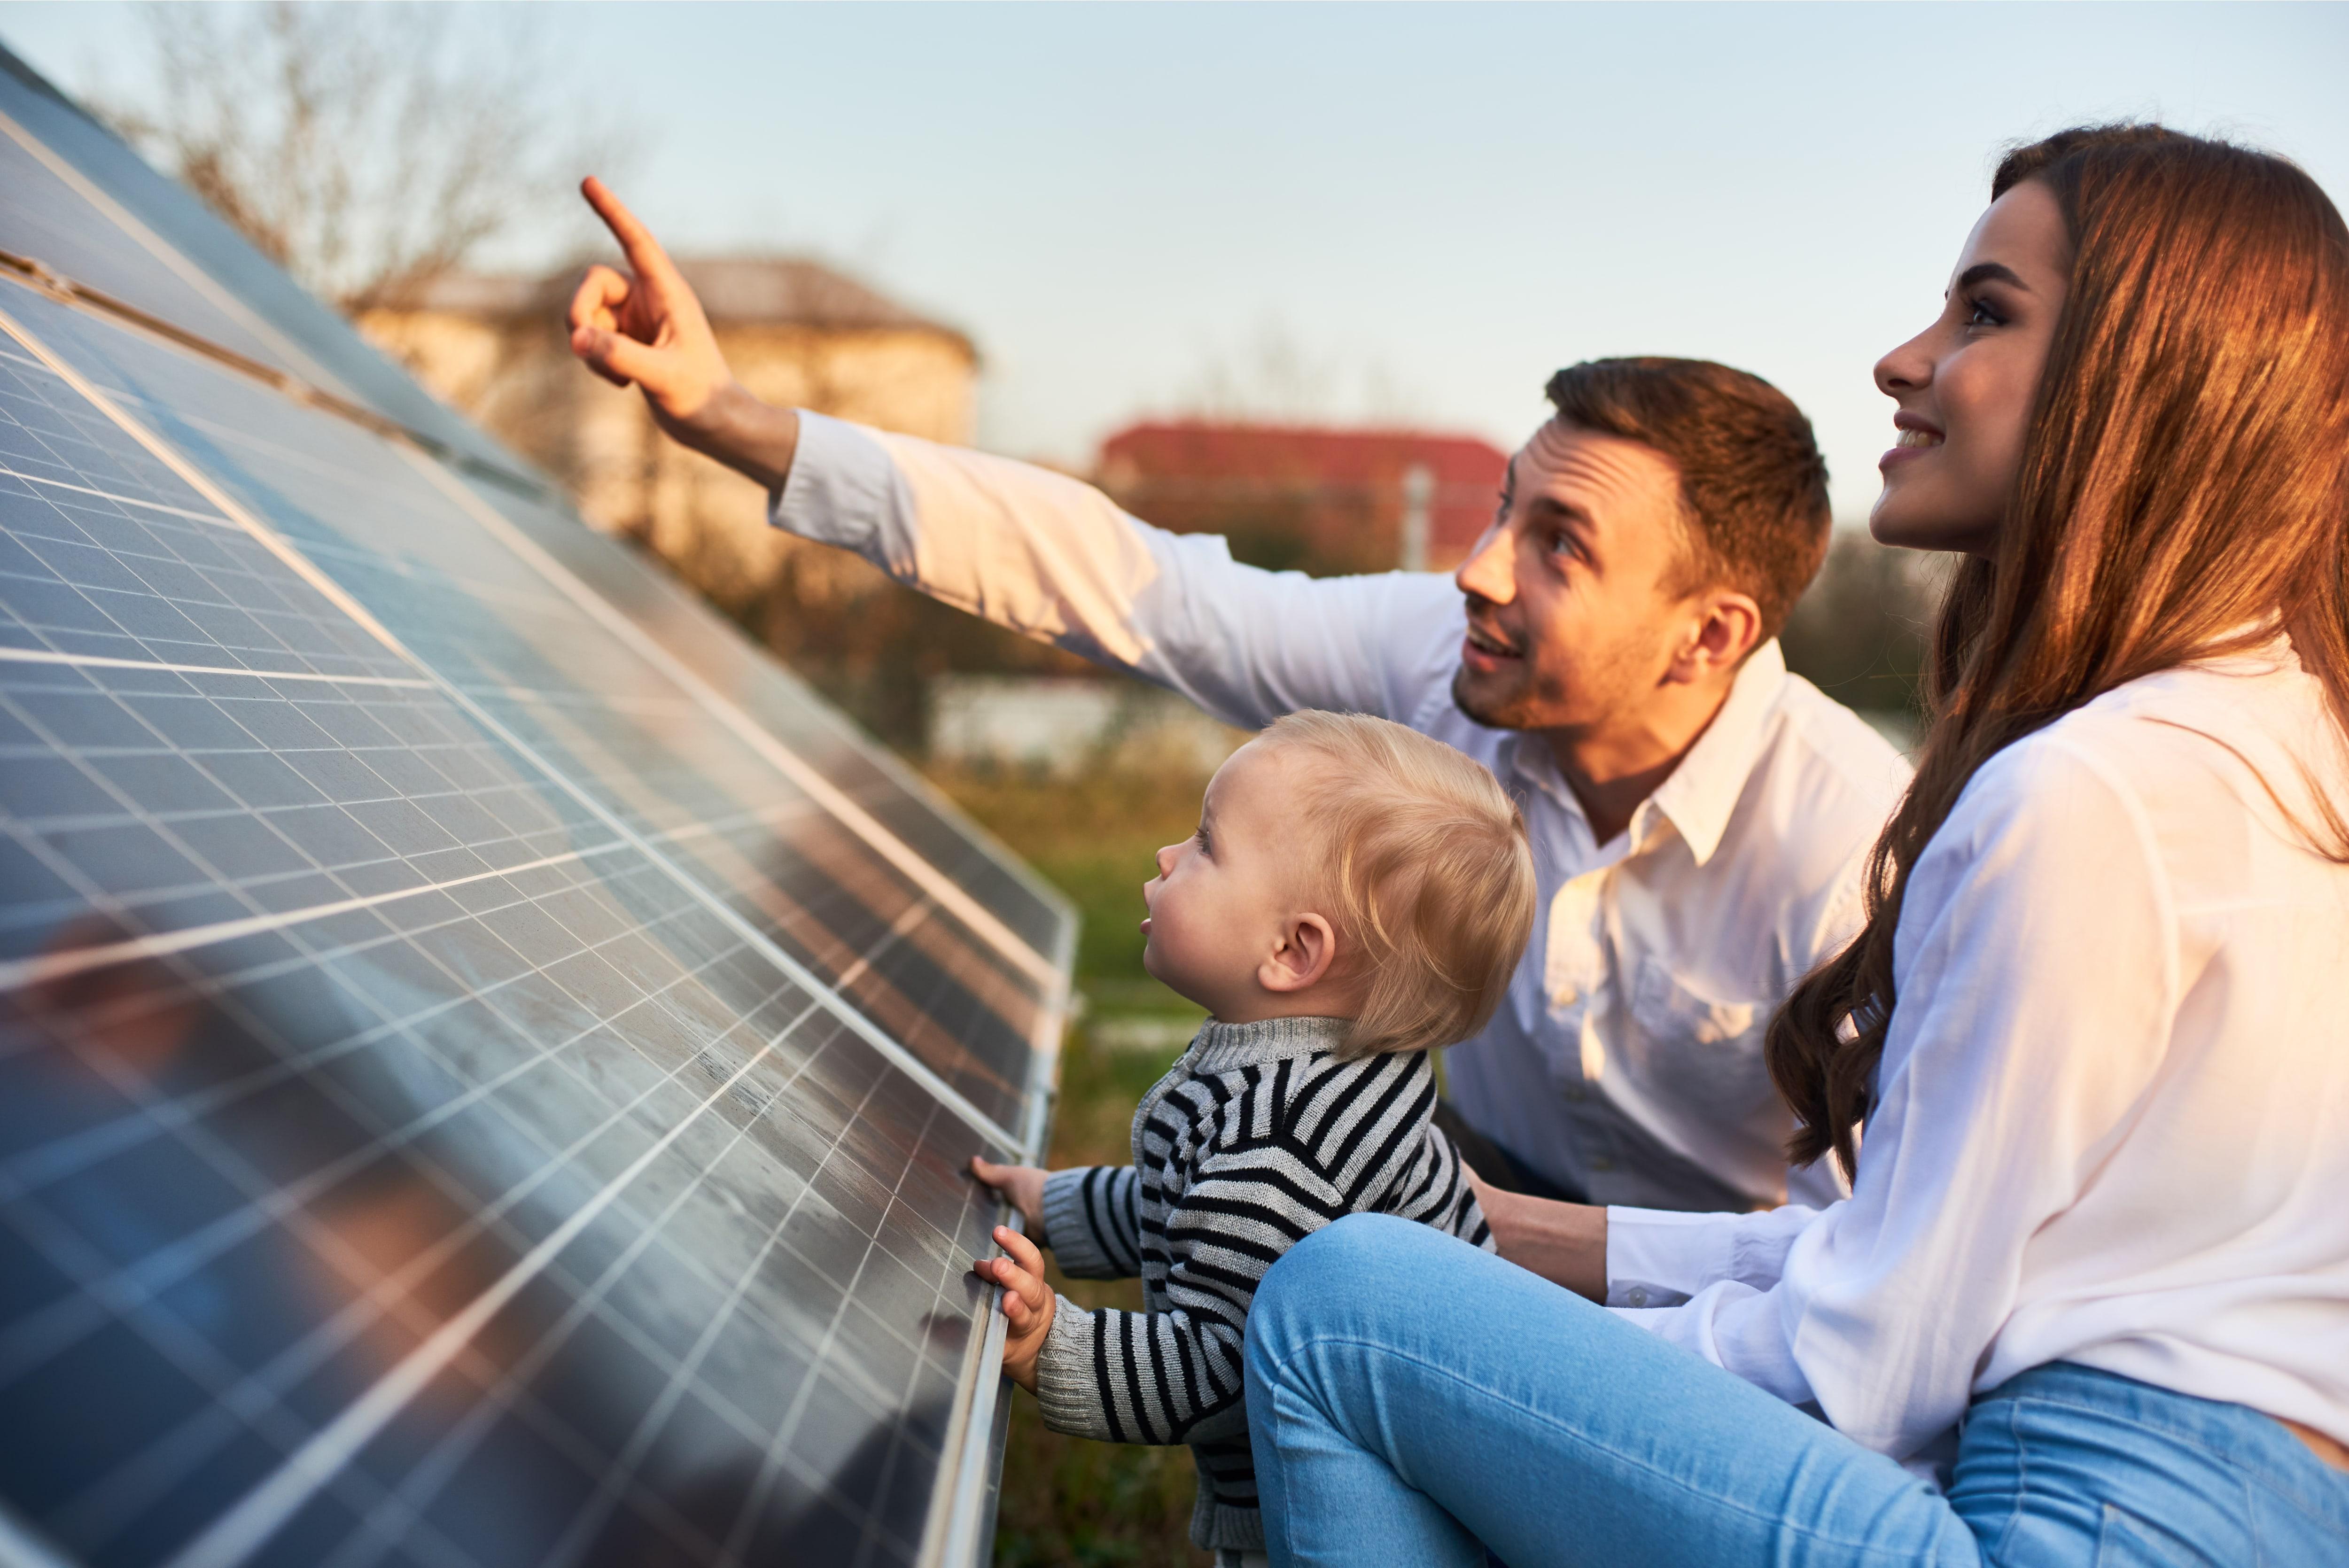 Familie Proggert zeigen Baby Felix die Solaranlage